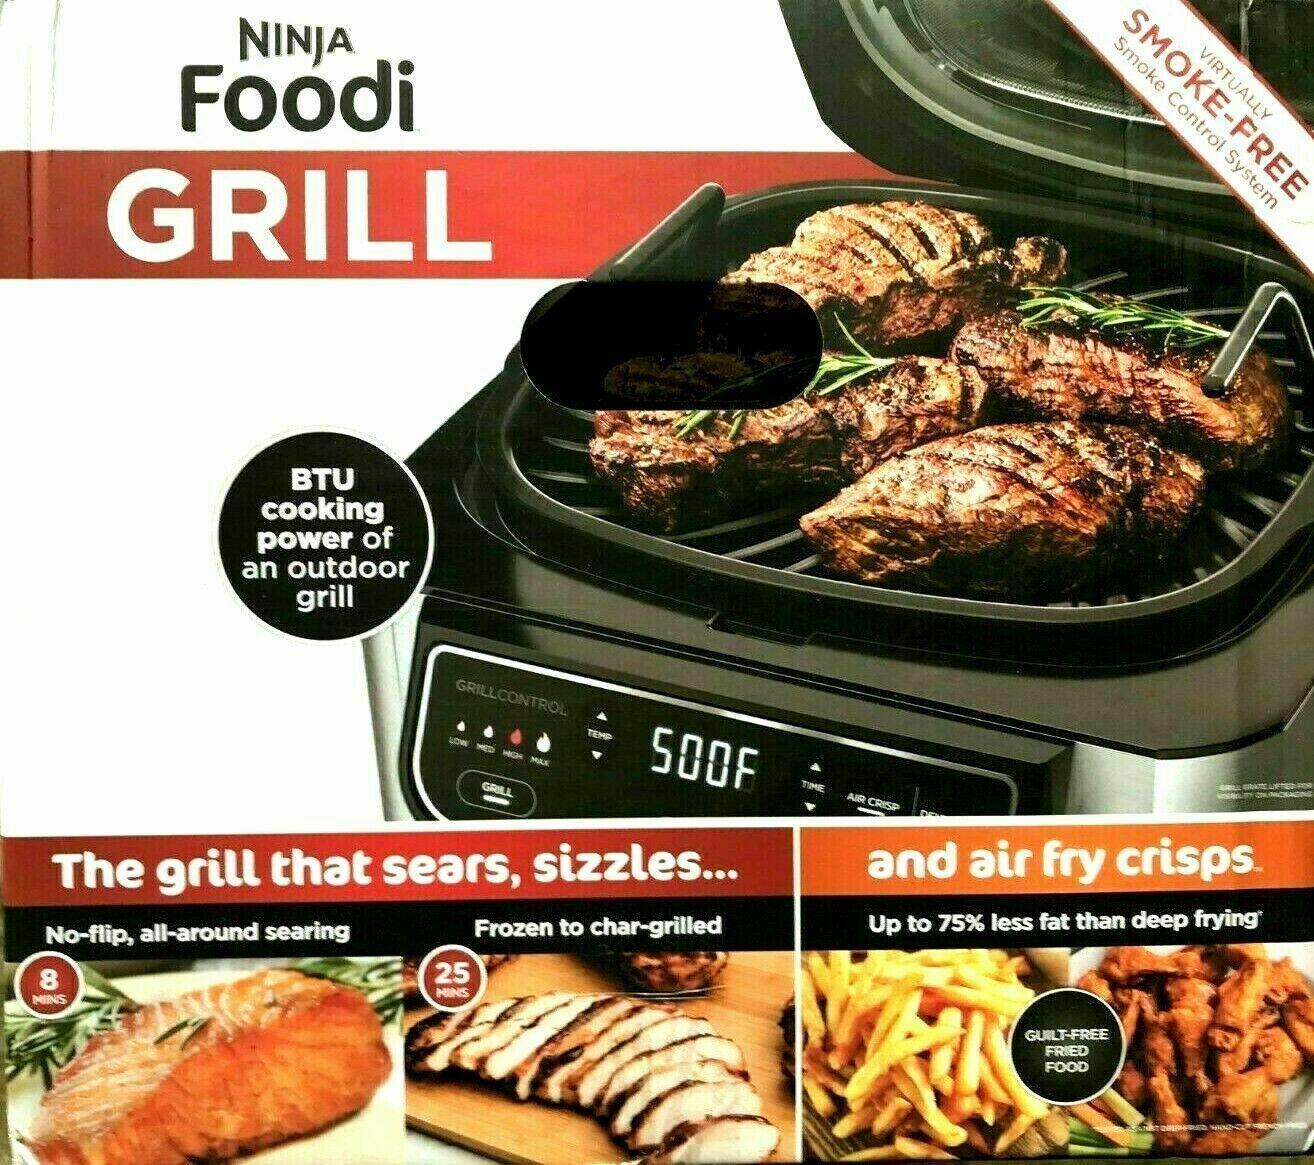 Ninja Foodi 5-in-1 Indoor Grill with Air Fry, Roast, Bake &